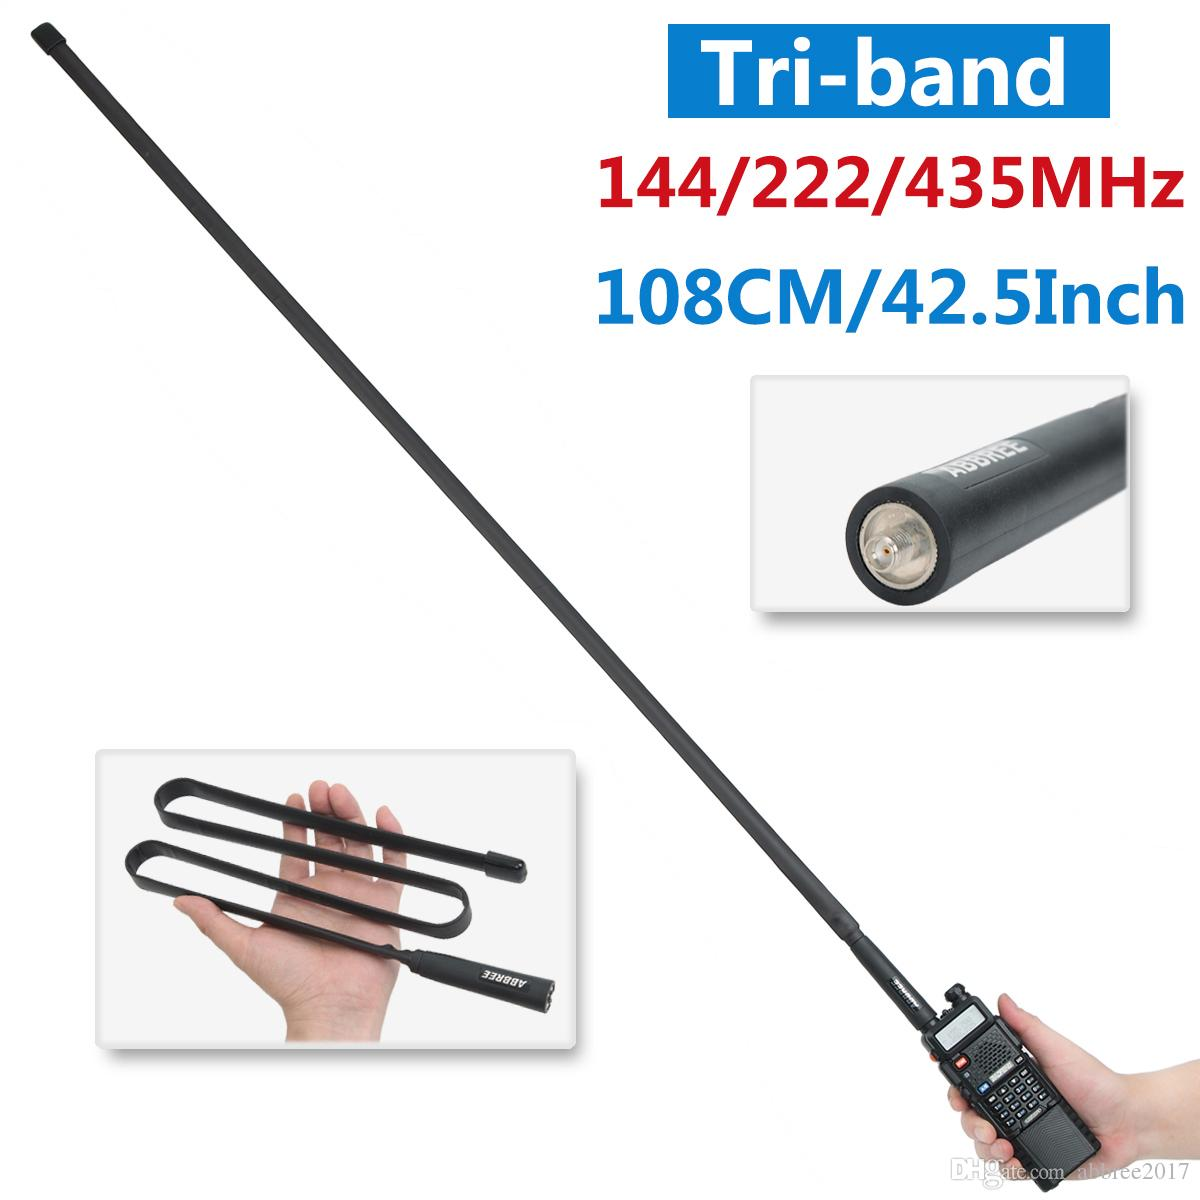 Antena tática ABBREE Tri-band 144/222 / 435Mhz SMA-Female para Baofeng BF-R3, UV-82T, UV-5RX3, UV-82X3, BTECH UV-5X3 Walkie Talkie